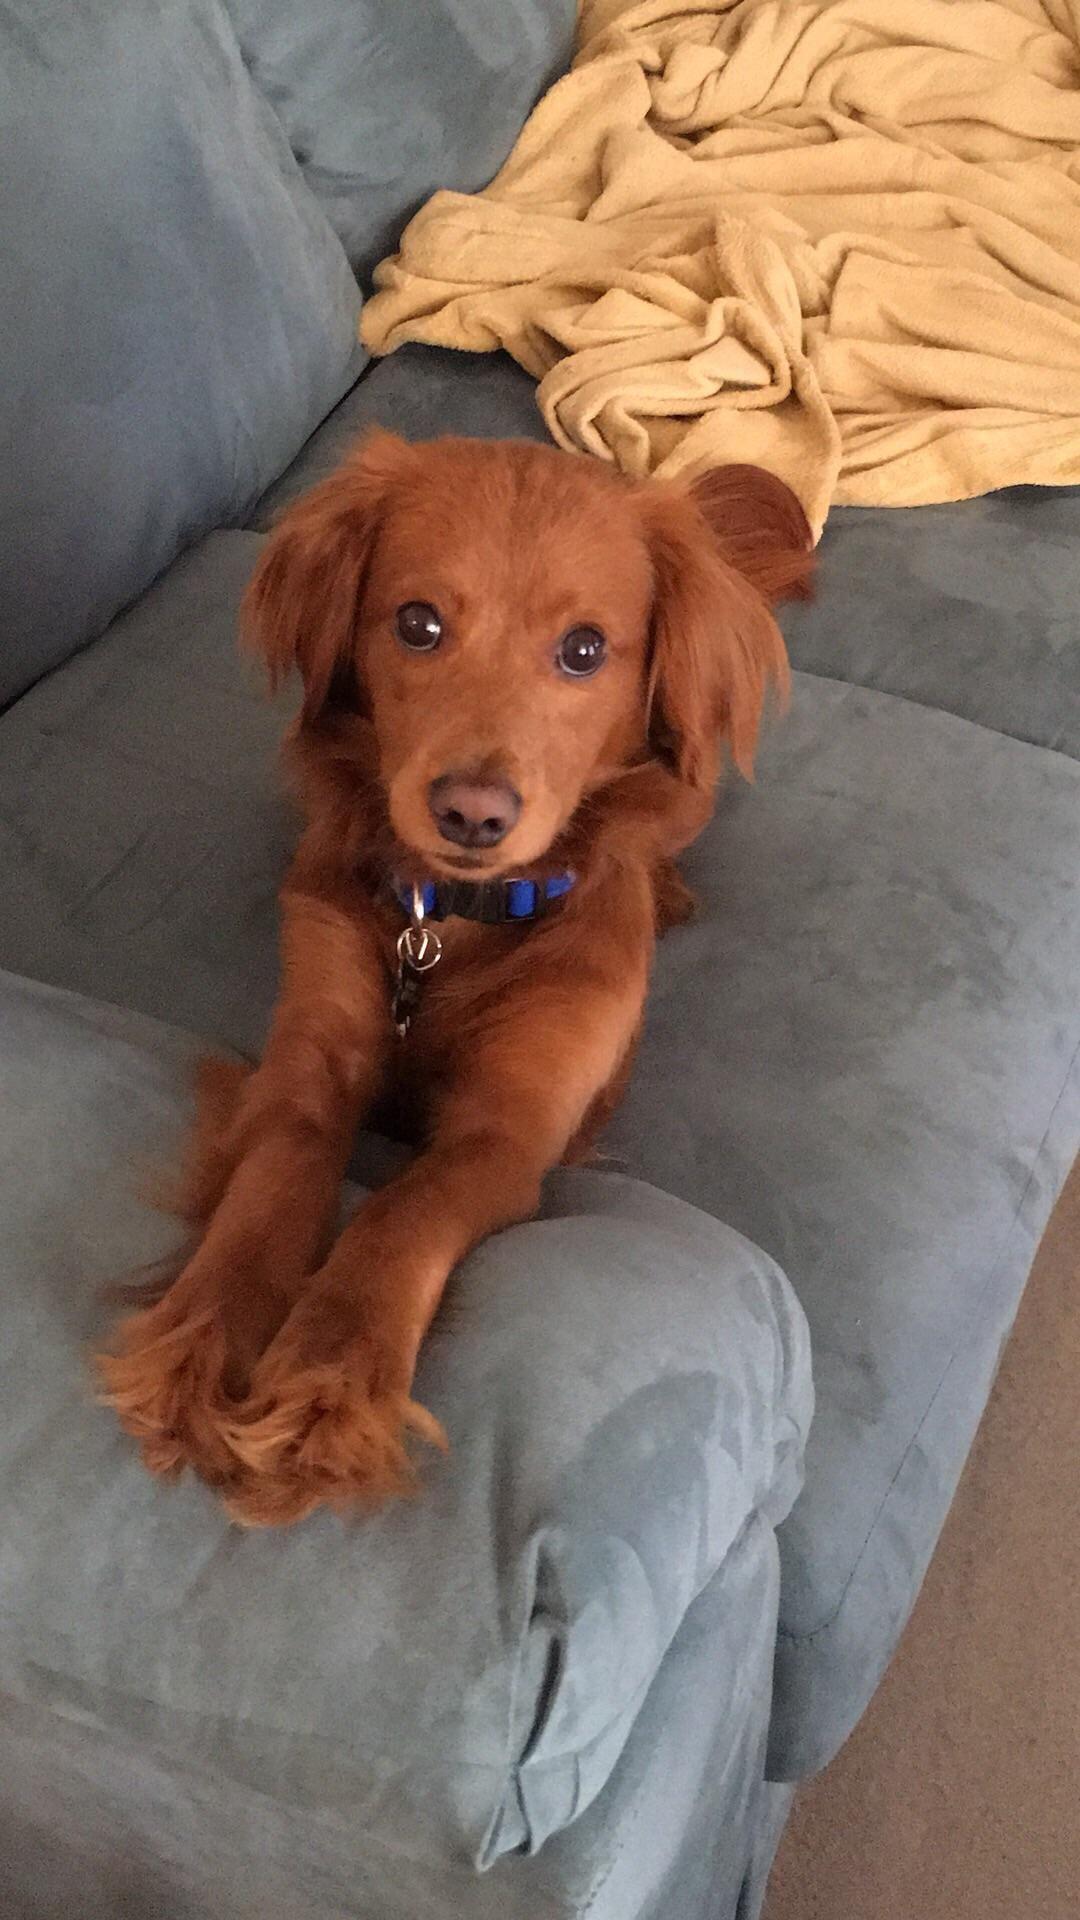 My best bud pretzel hes got the puppy dog eyes down ift